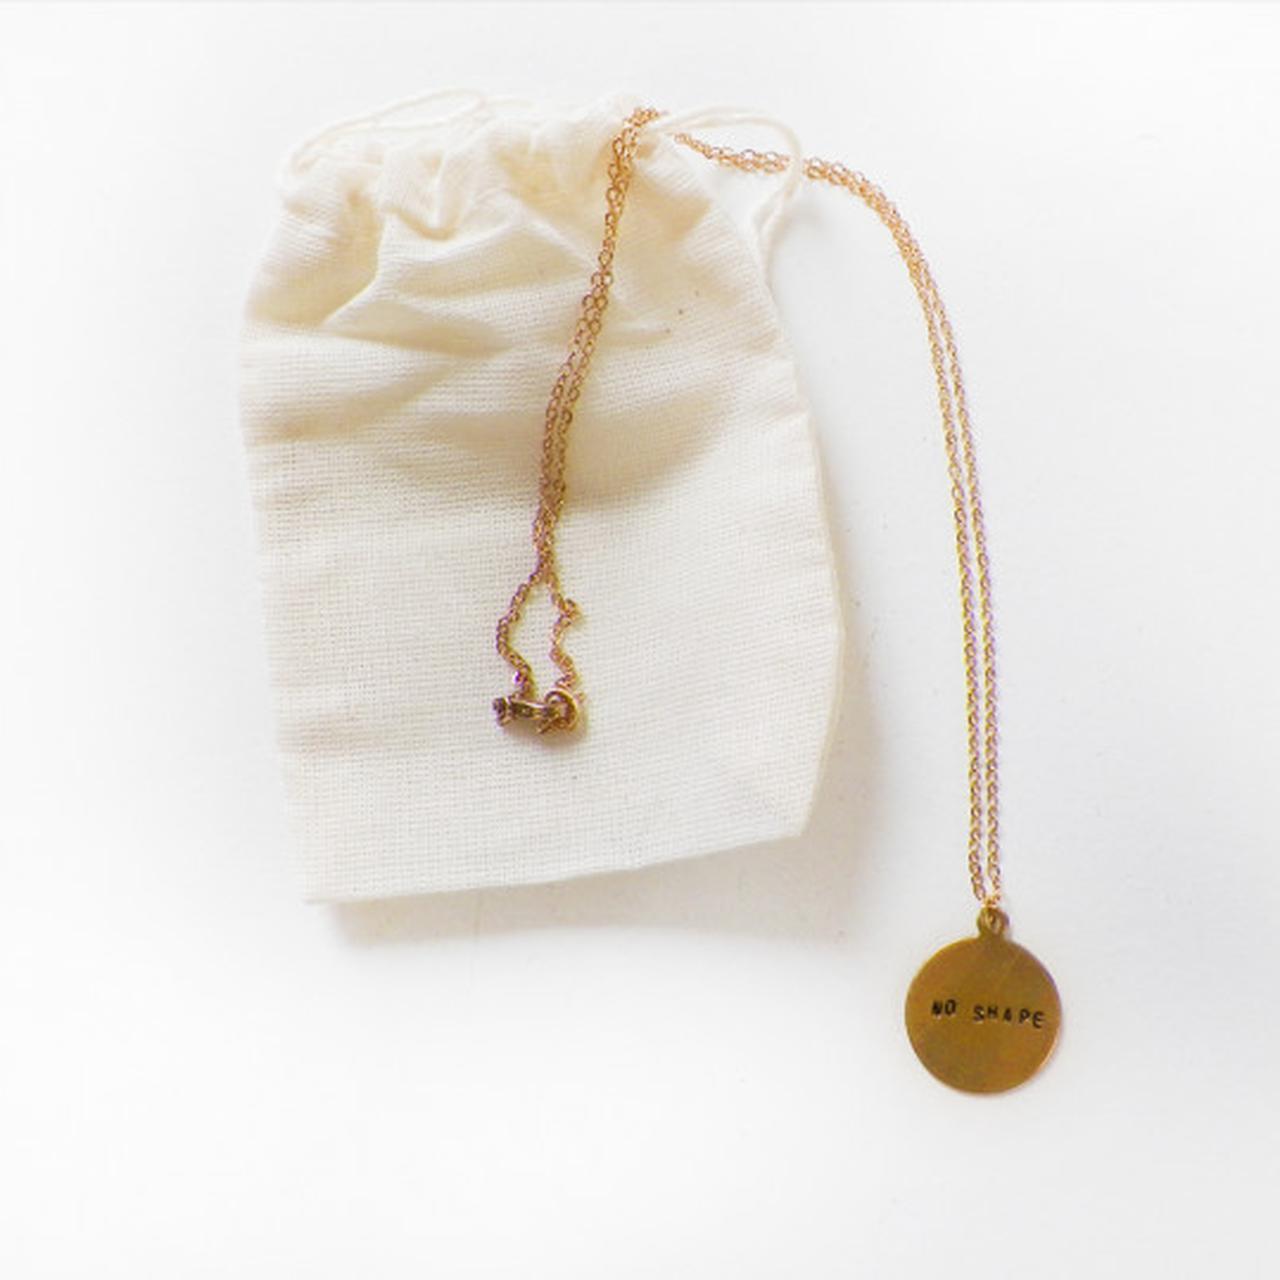 Perfume Genius No Shape Charm Necklace